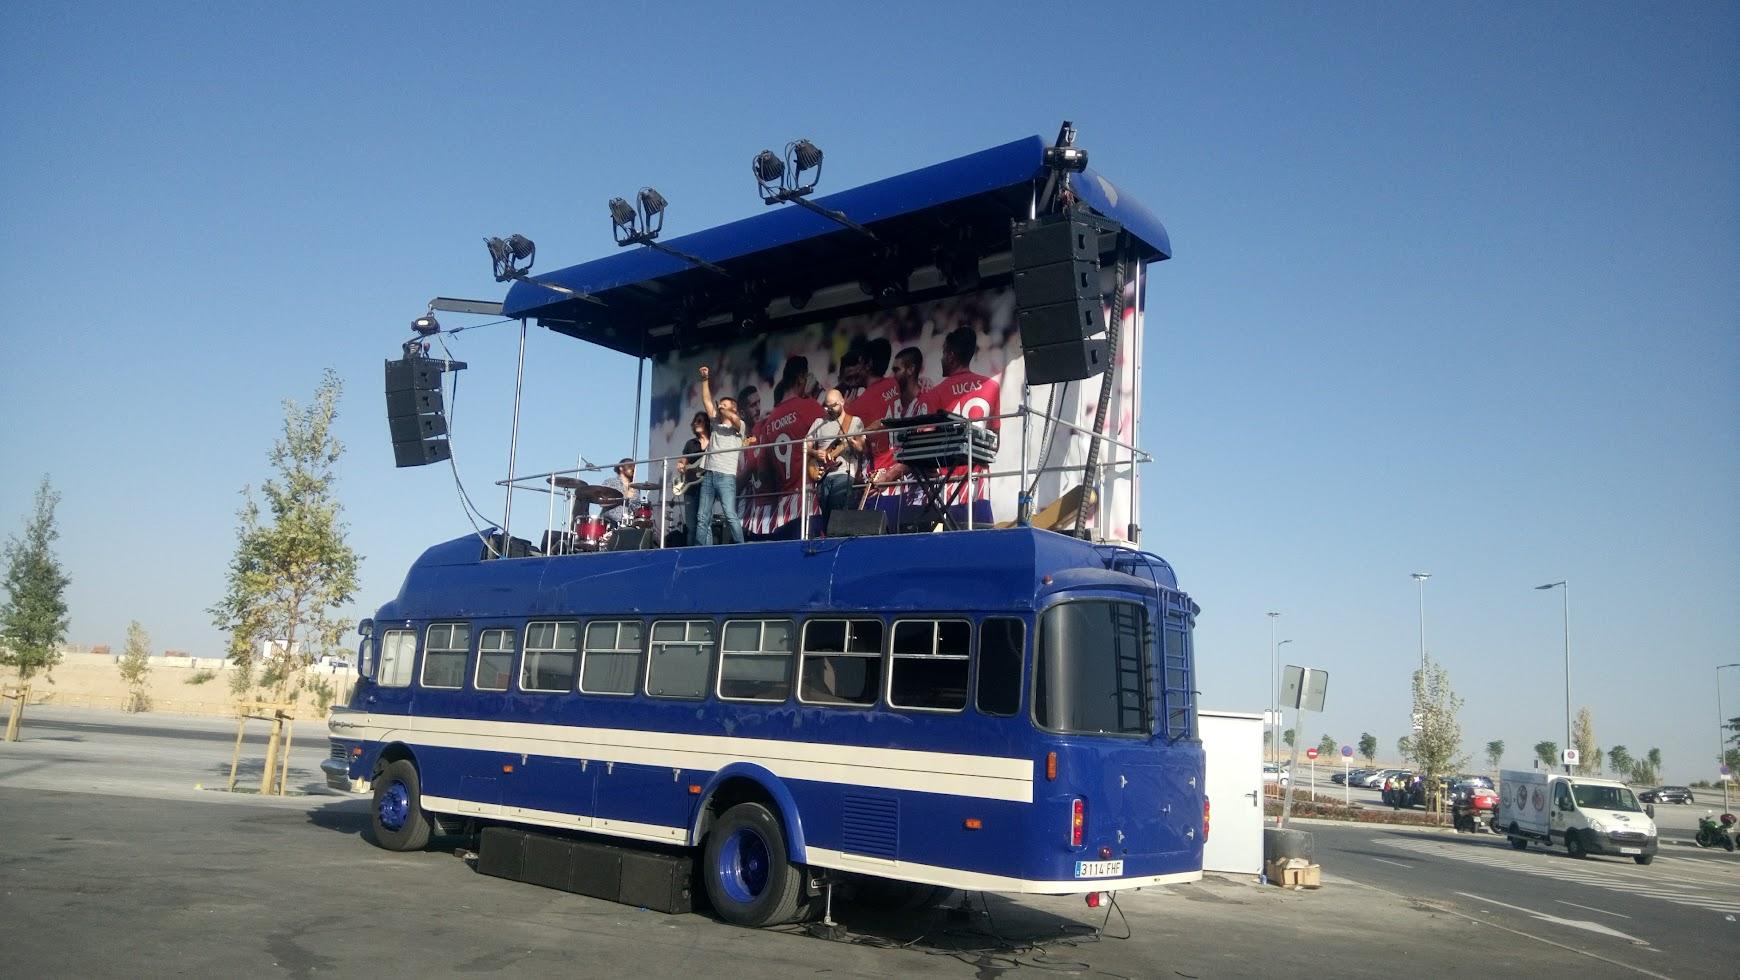 grupo de música tocando encima de autobús Atletico de Madrid 2017